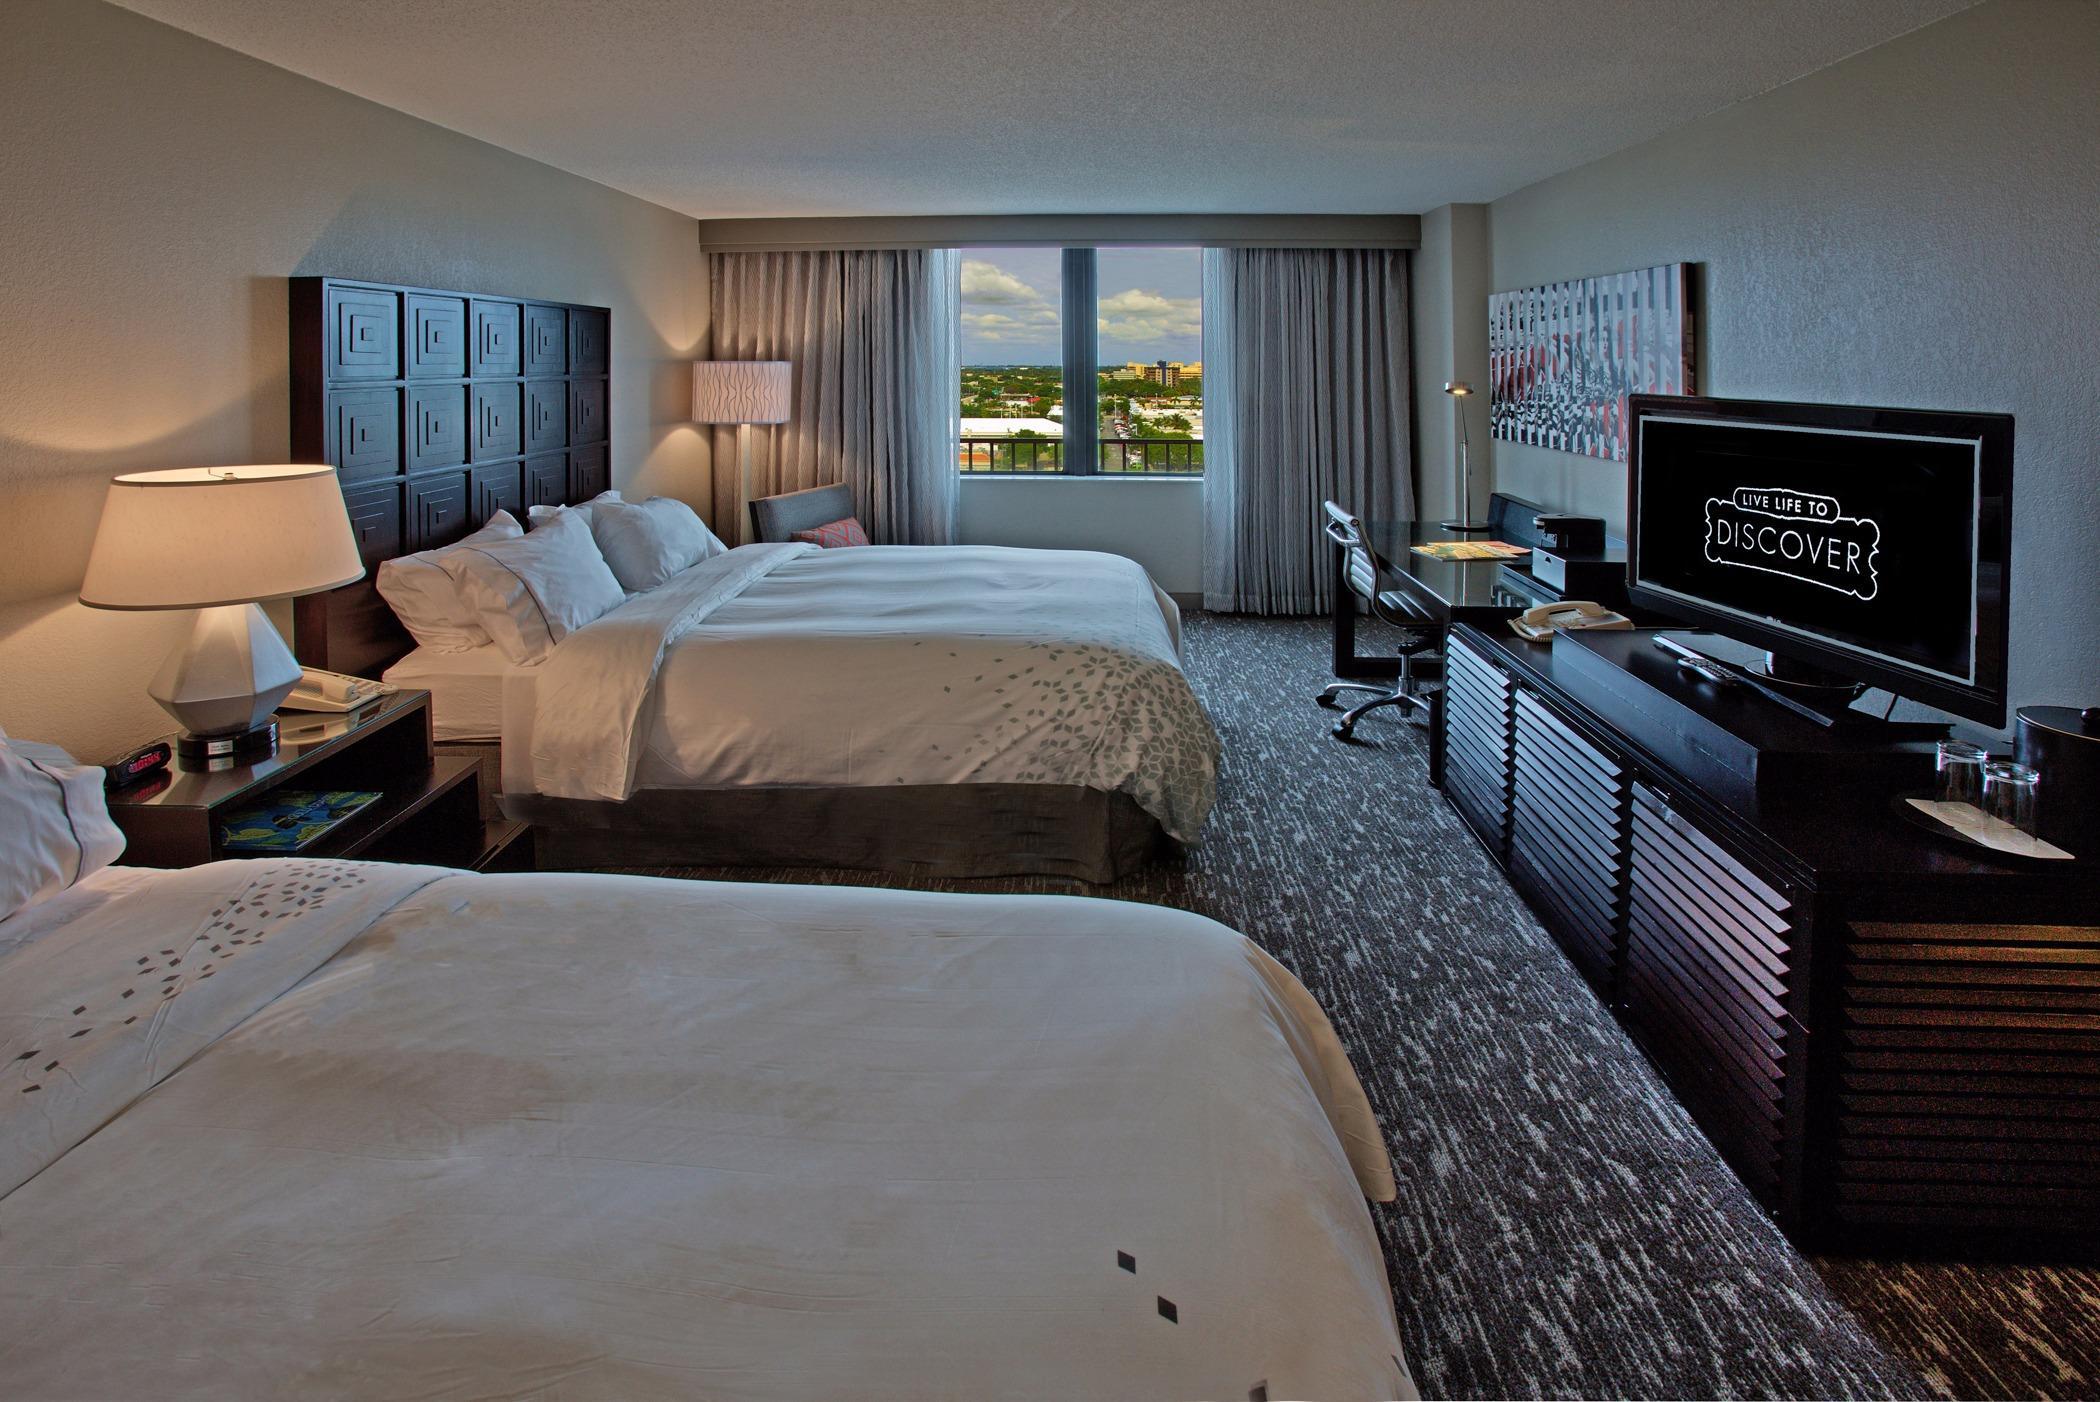 Renaissance Fort Lauderdale Cruise Port Hotel image 7